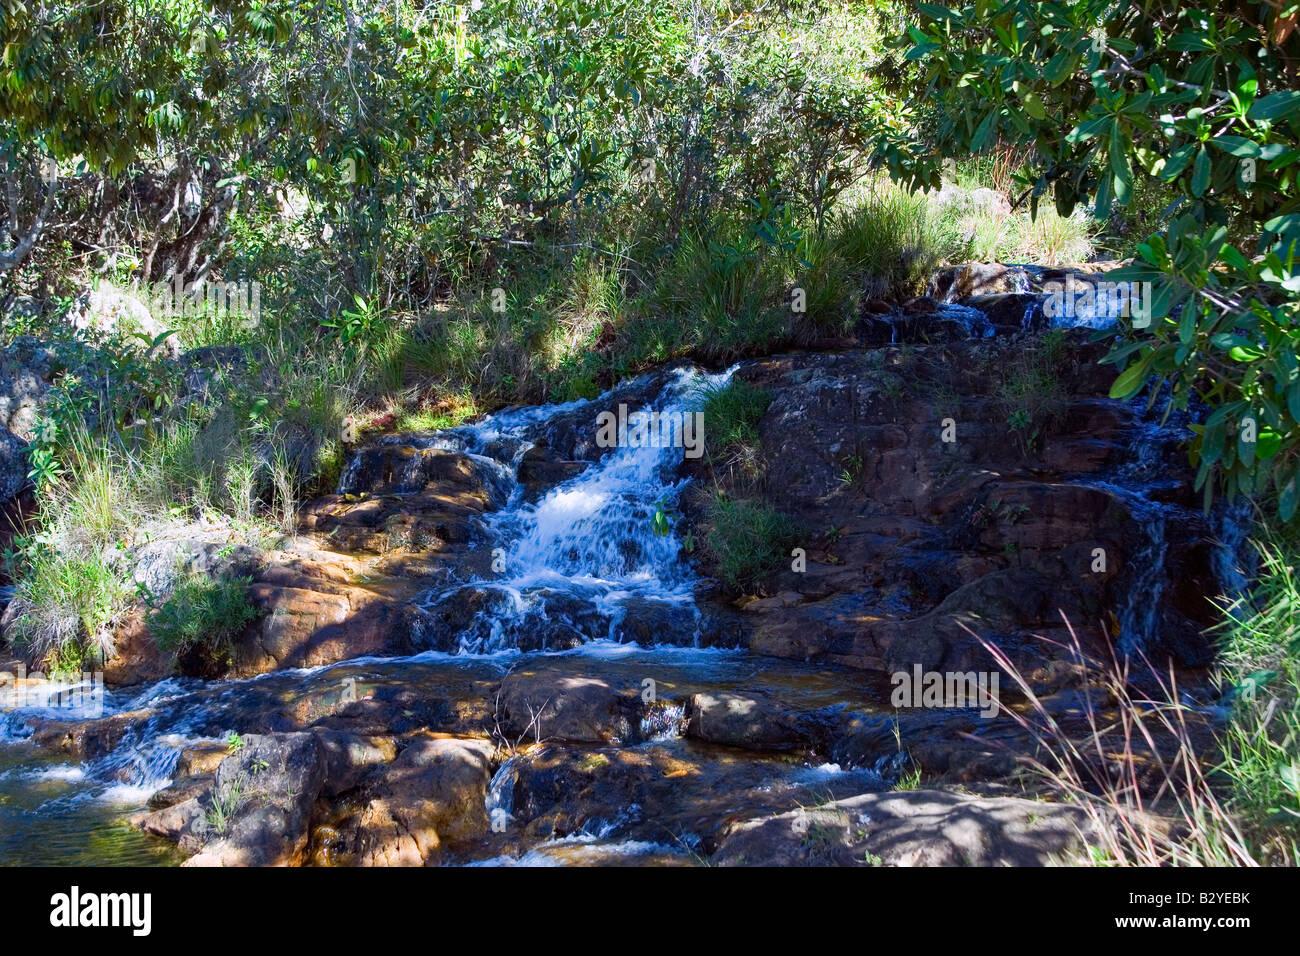 Waterfall, Cristal River, Rio Cristal, Chapada dos Veadeiros, Veadeiros Tableland, Goias, Brazil Stock Photo